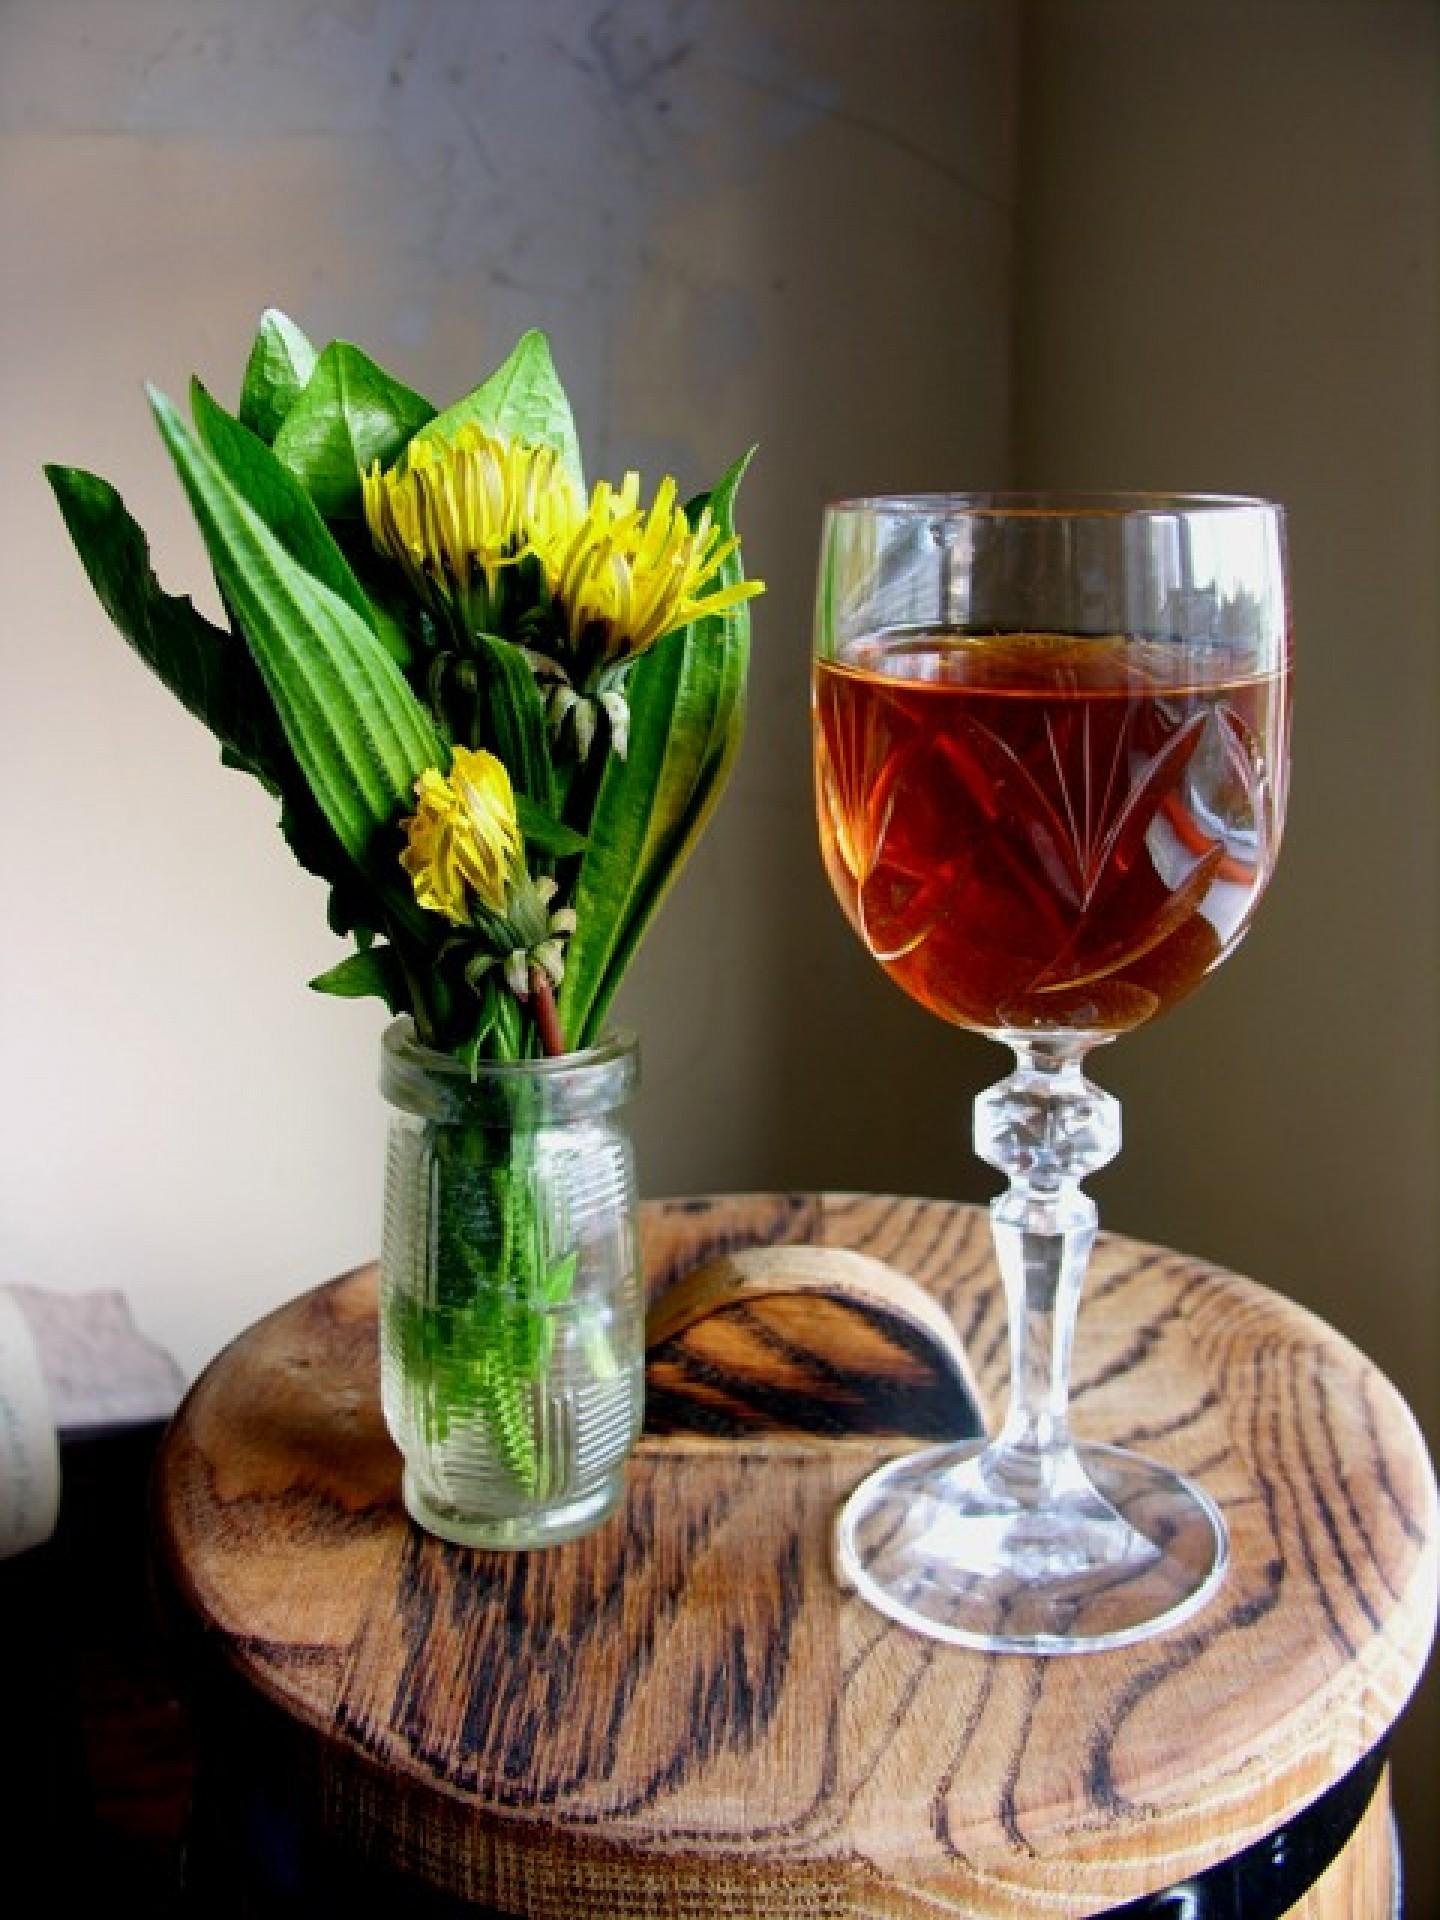 dandelion wine with dandelion posy